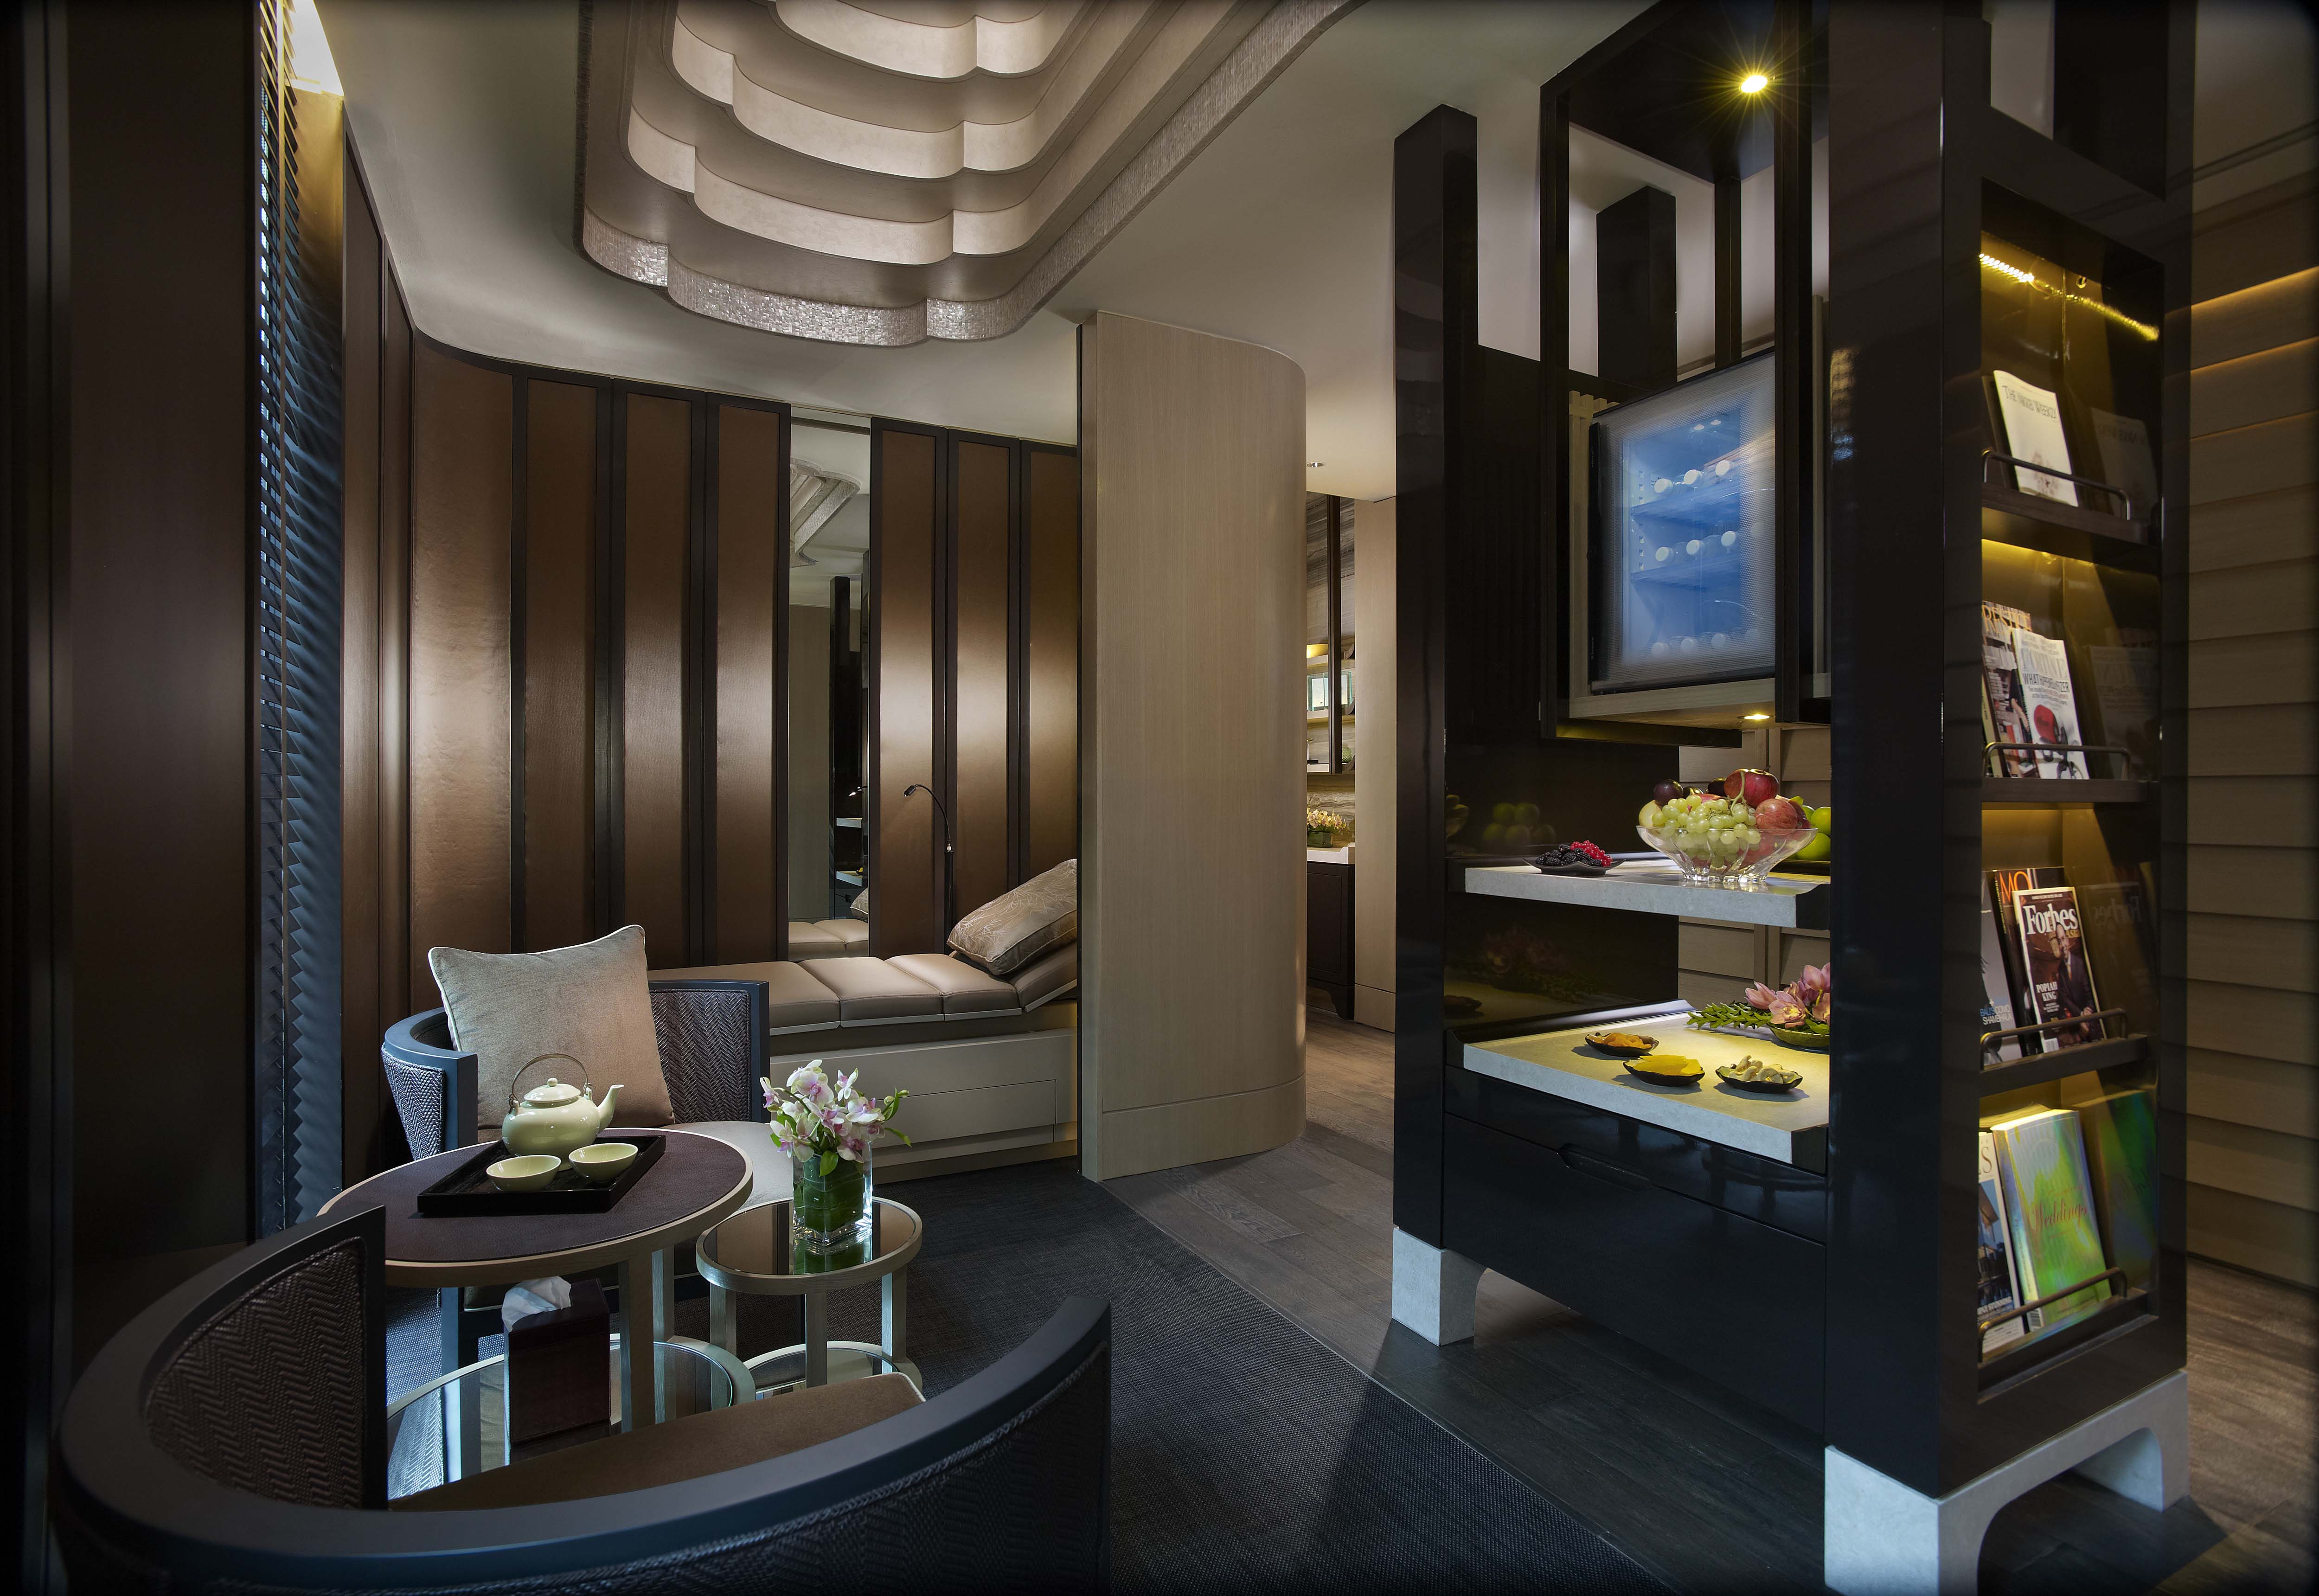 Mandarin oriental singapore unveils a luxurious new for Oriental furniture singapore